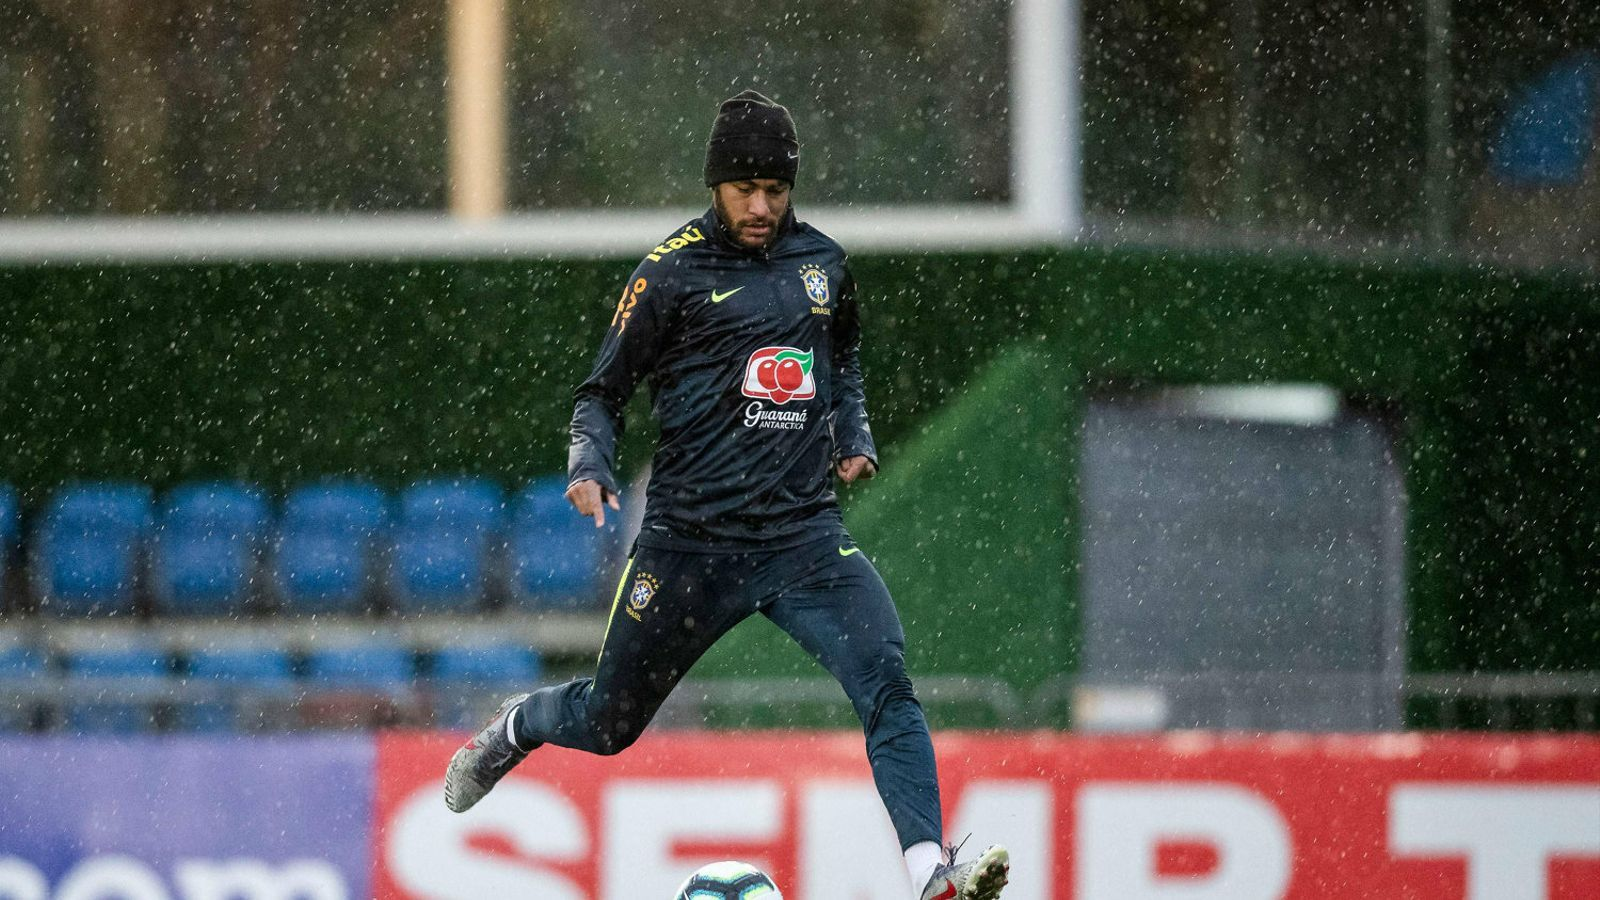 La vida privada asfixia Neymar